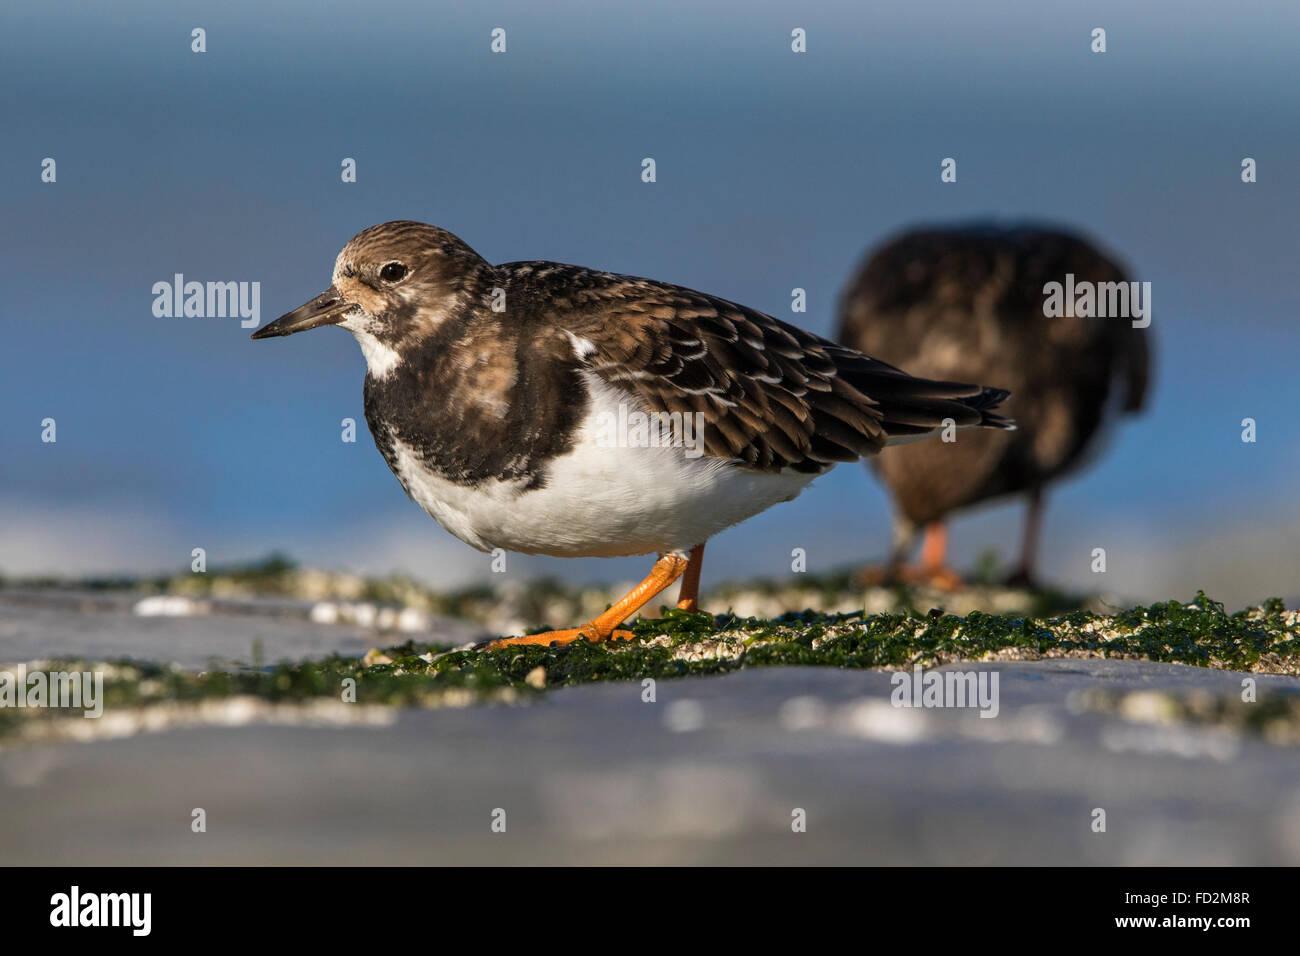 Ruddy turnstones (Arenaria interpres) in non-breeding plumage foraging along the North Sea coast in winter - Stock Image